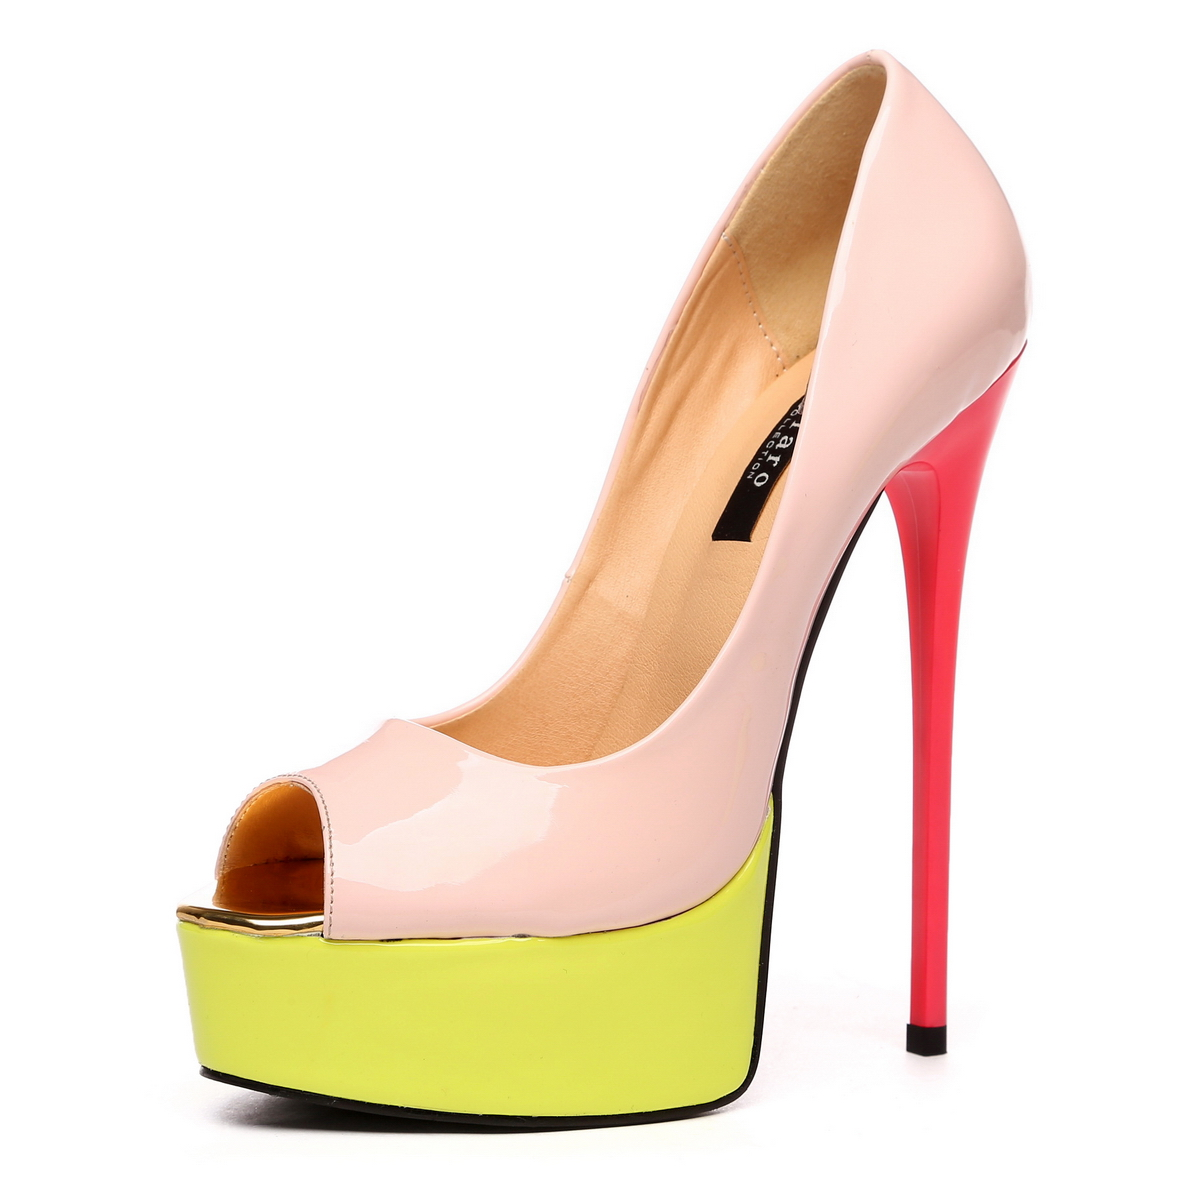 GIARO - Damen Plateau High Heel Pumps - Lack Merfarbig Schuhe in Übergrößen – Bild 1